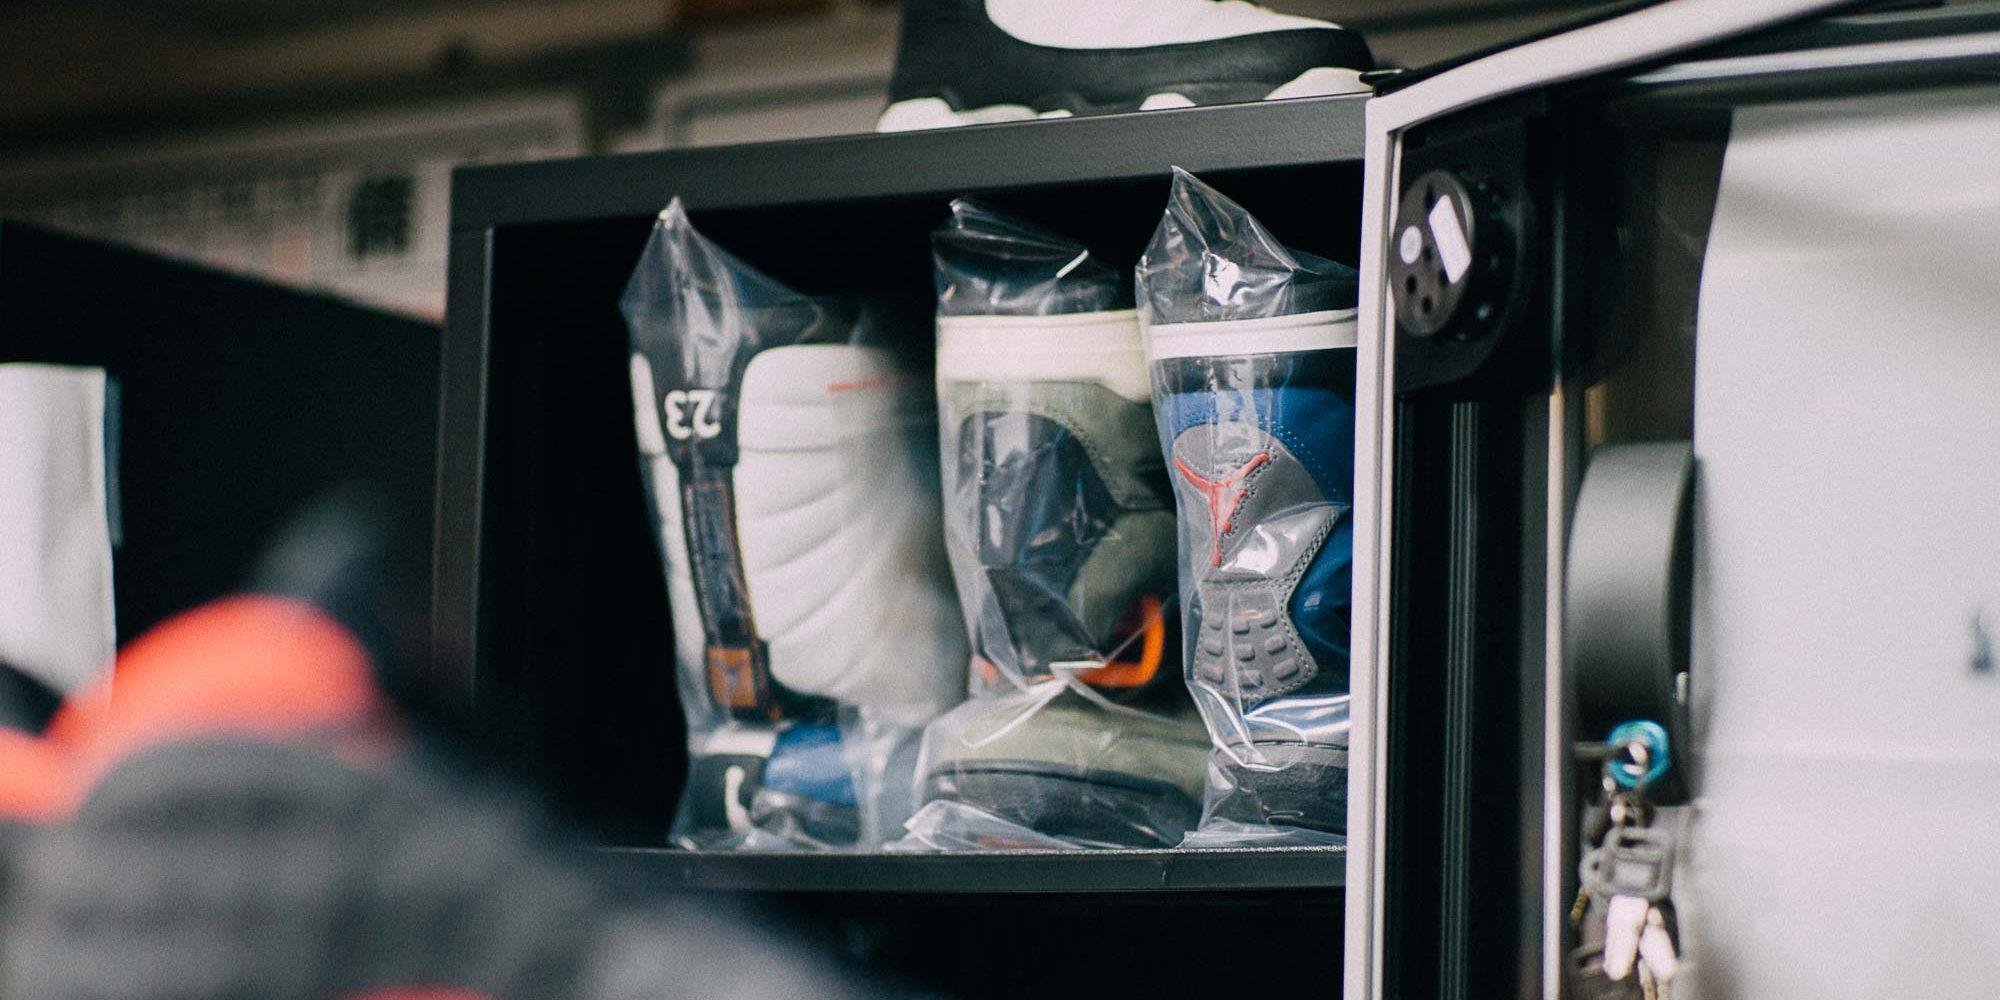 Carter 珍藏的 Eminem AJ4 與 UNDFTD AJ4 ,每一雙都是好幾千美金的超高單價收藏逸品。